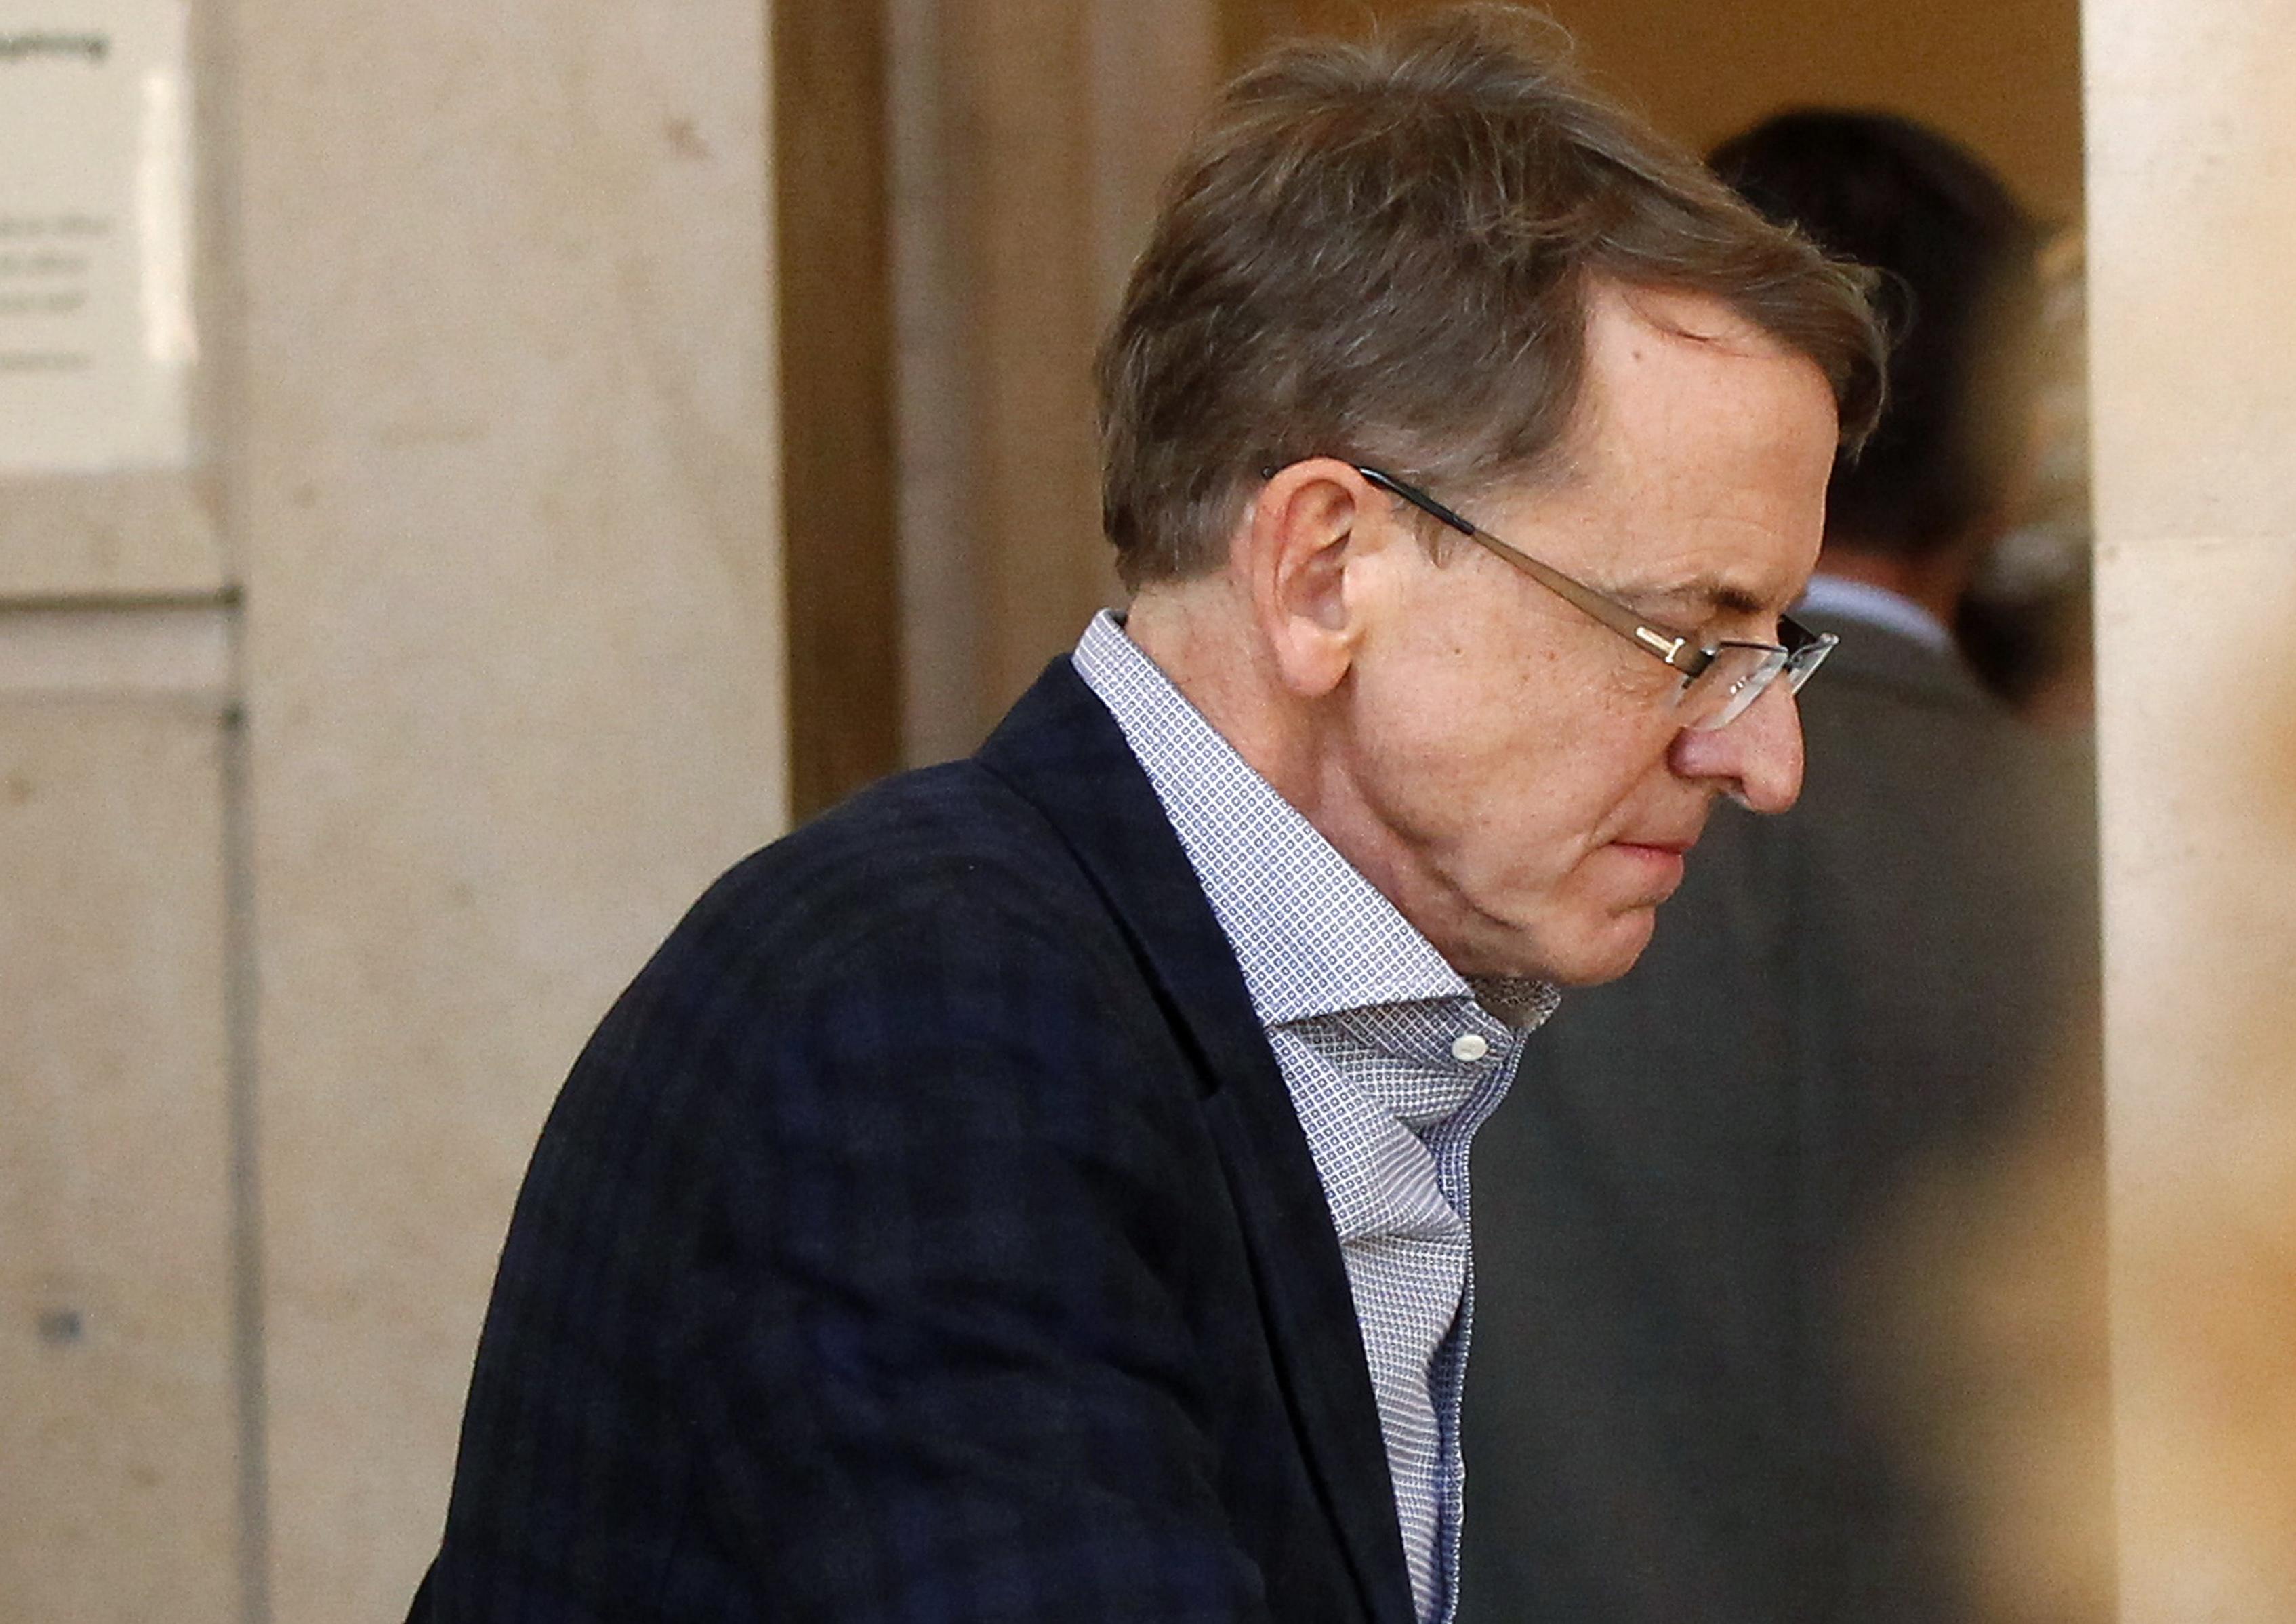 Venture capitalist Doerr arrives at San Francisco Superior Court